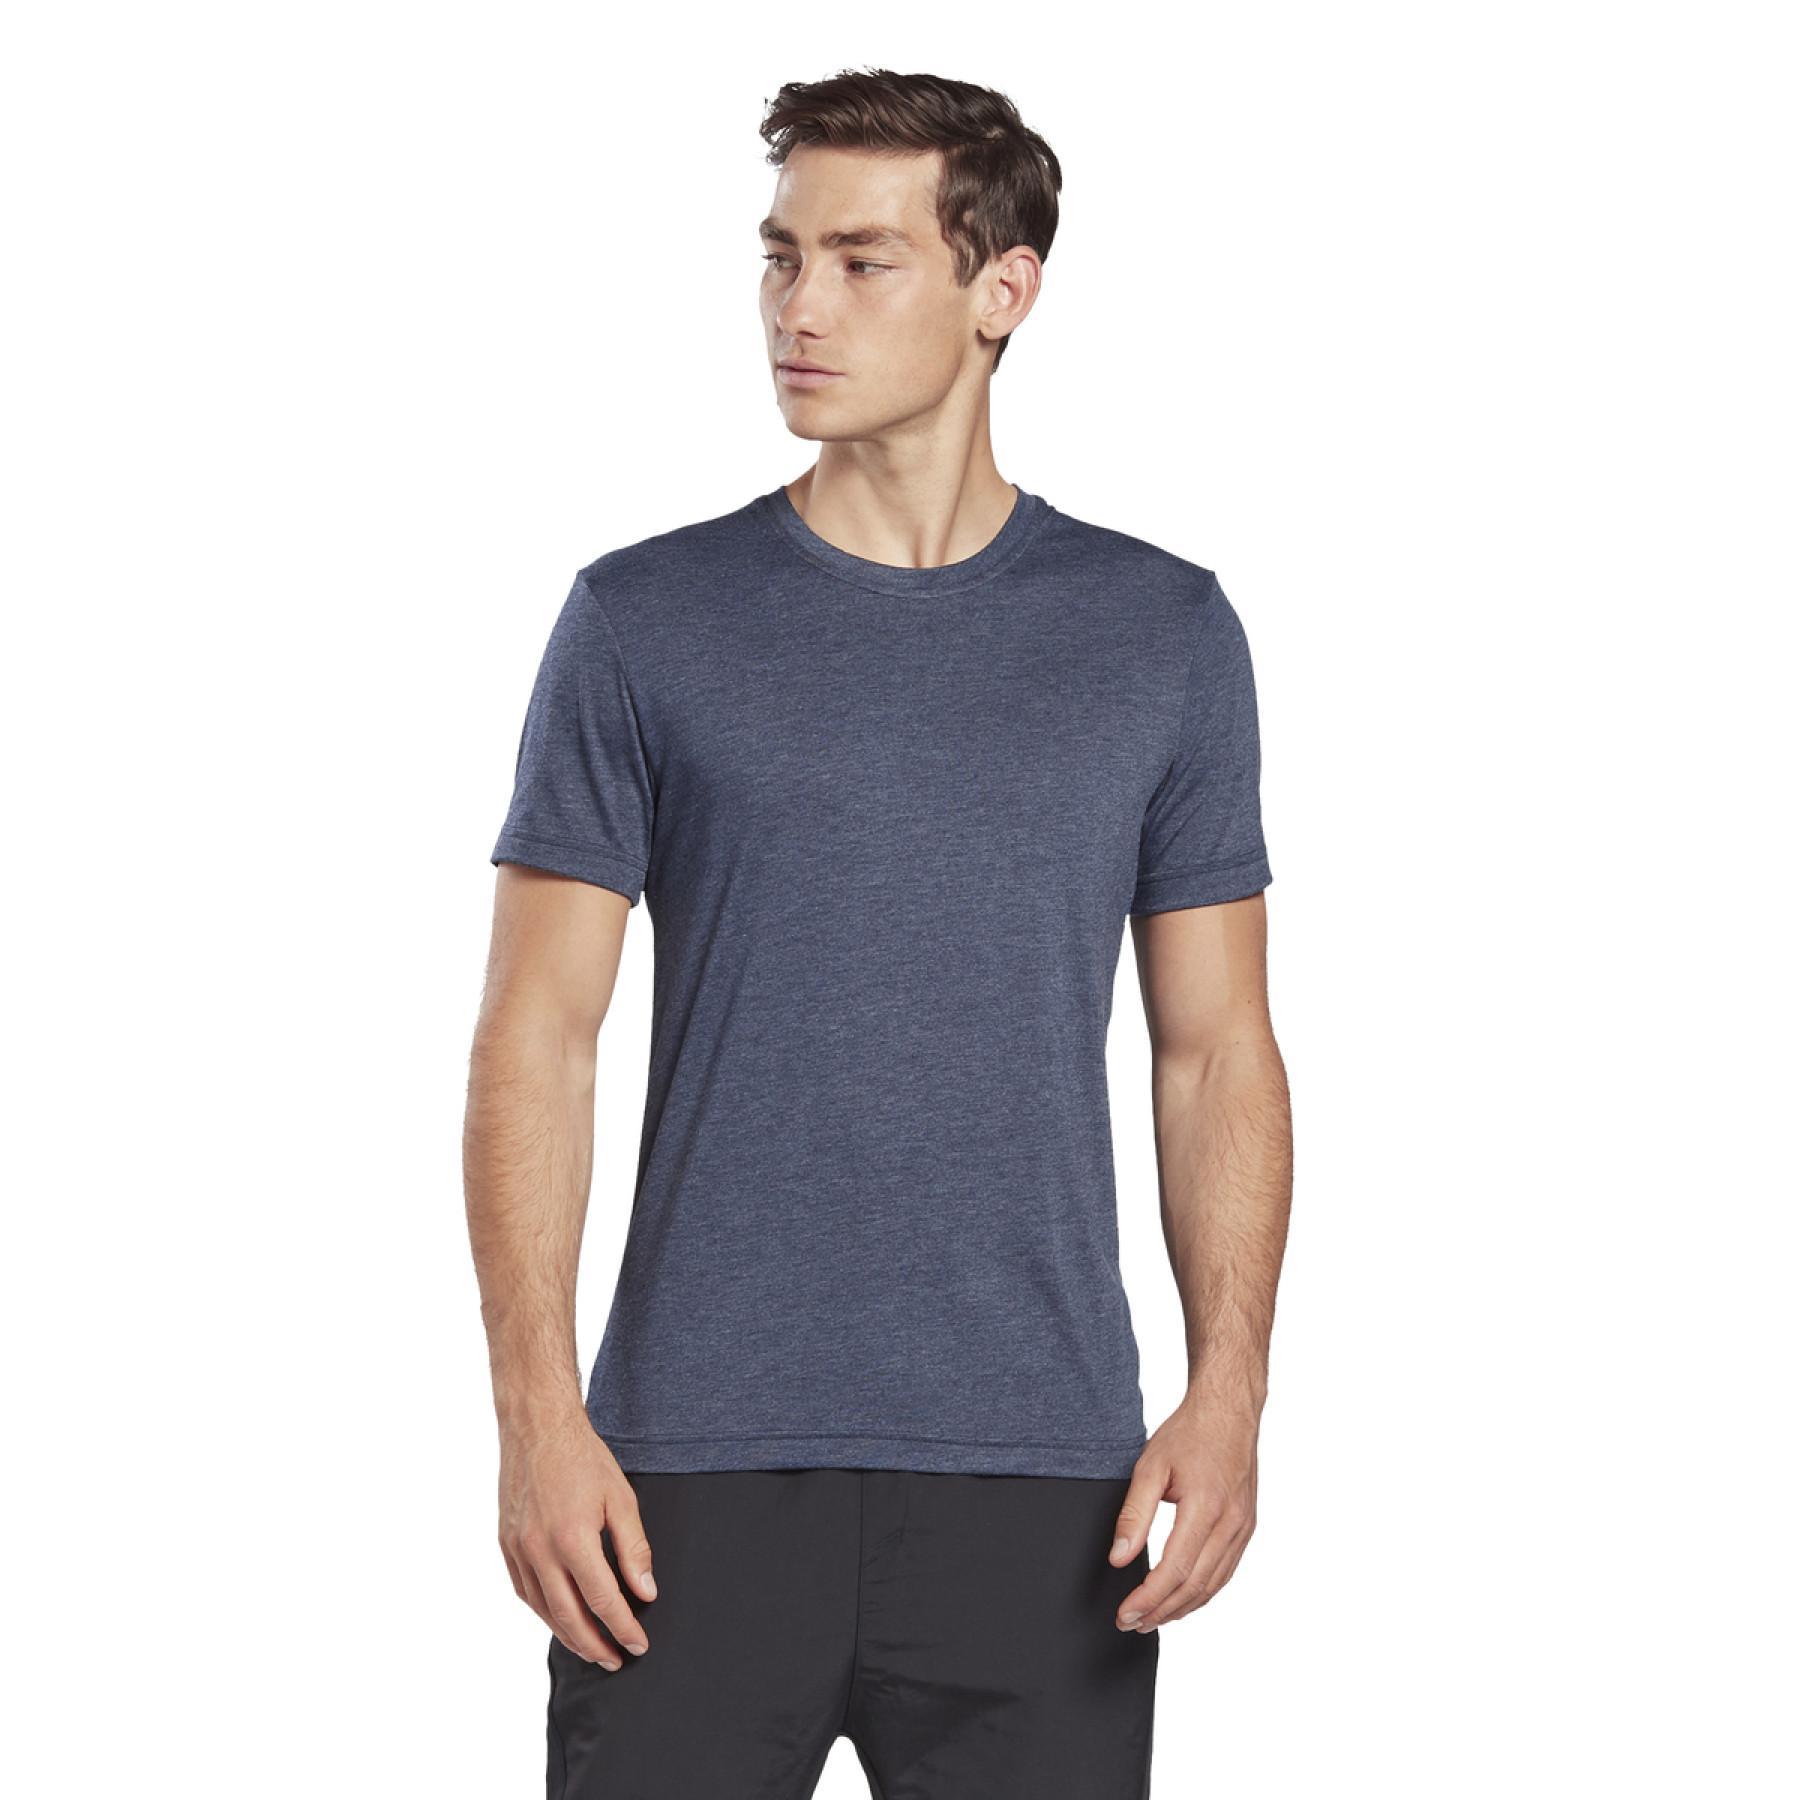 Reebok GB Tri-Blend Vector T-shirt